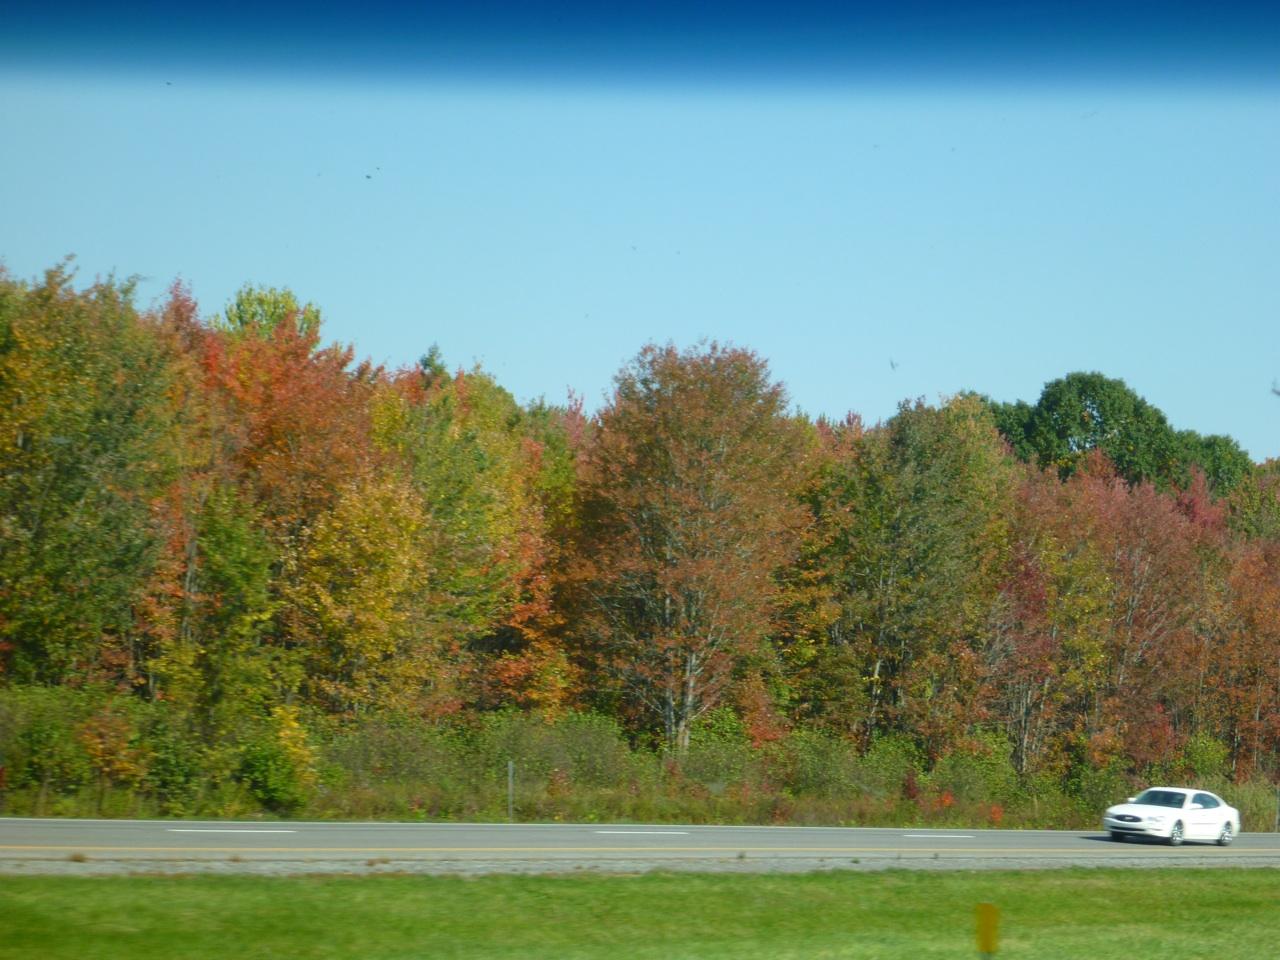 Fall Colors In Full Bloom